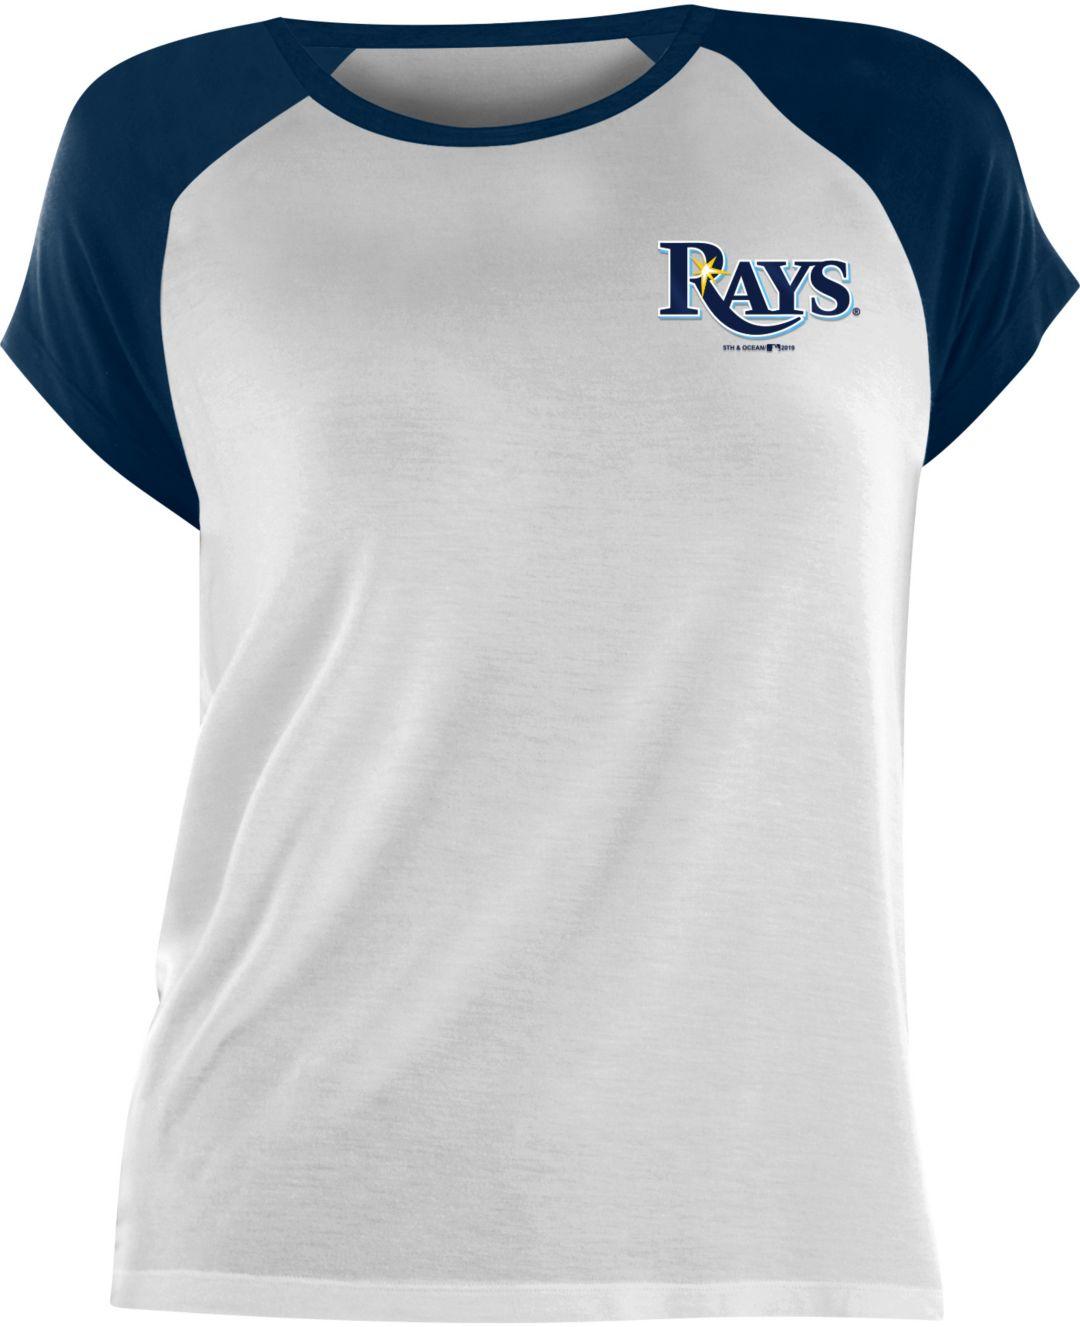 823a522e New Era Women's Tampa Bay Rays Tri-Blend T-Shirt